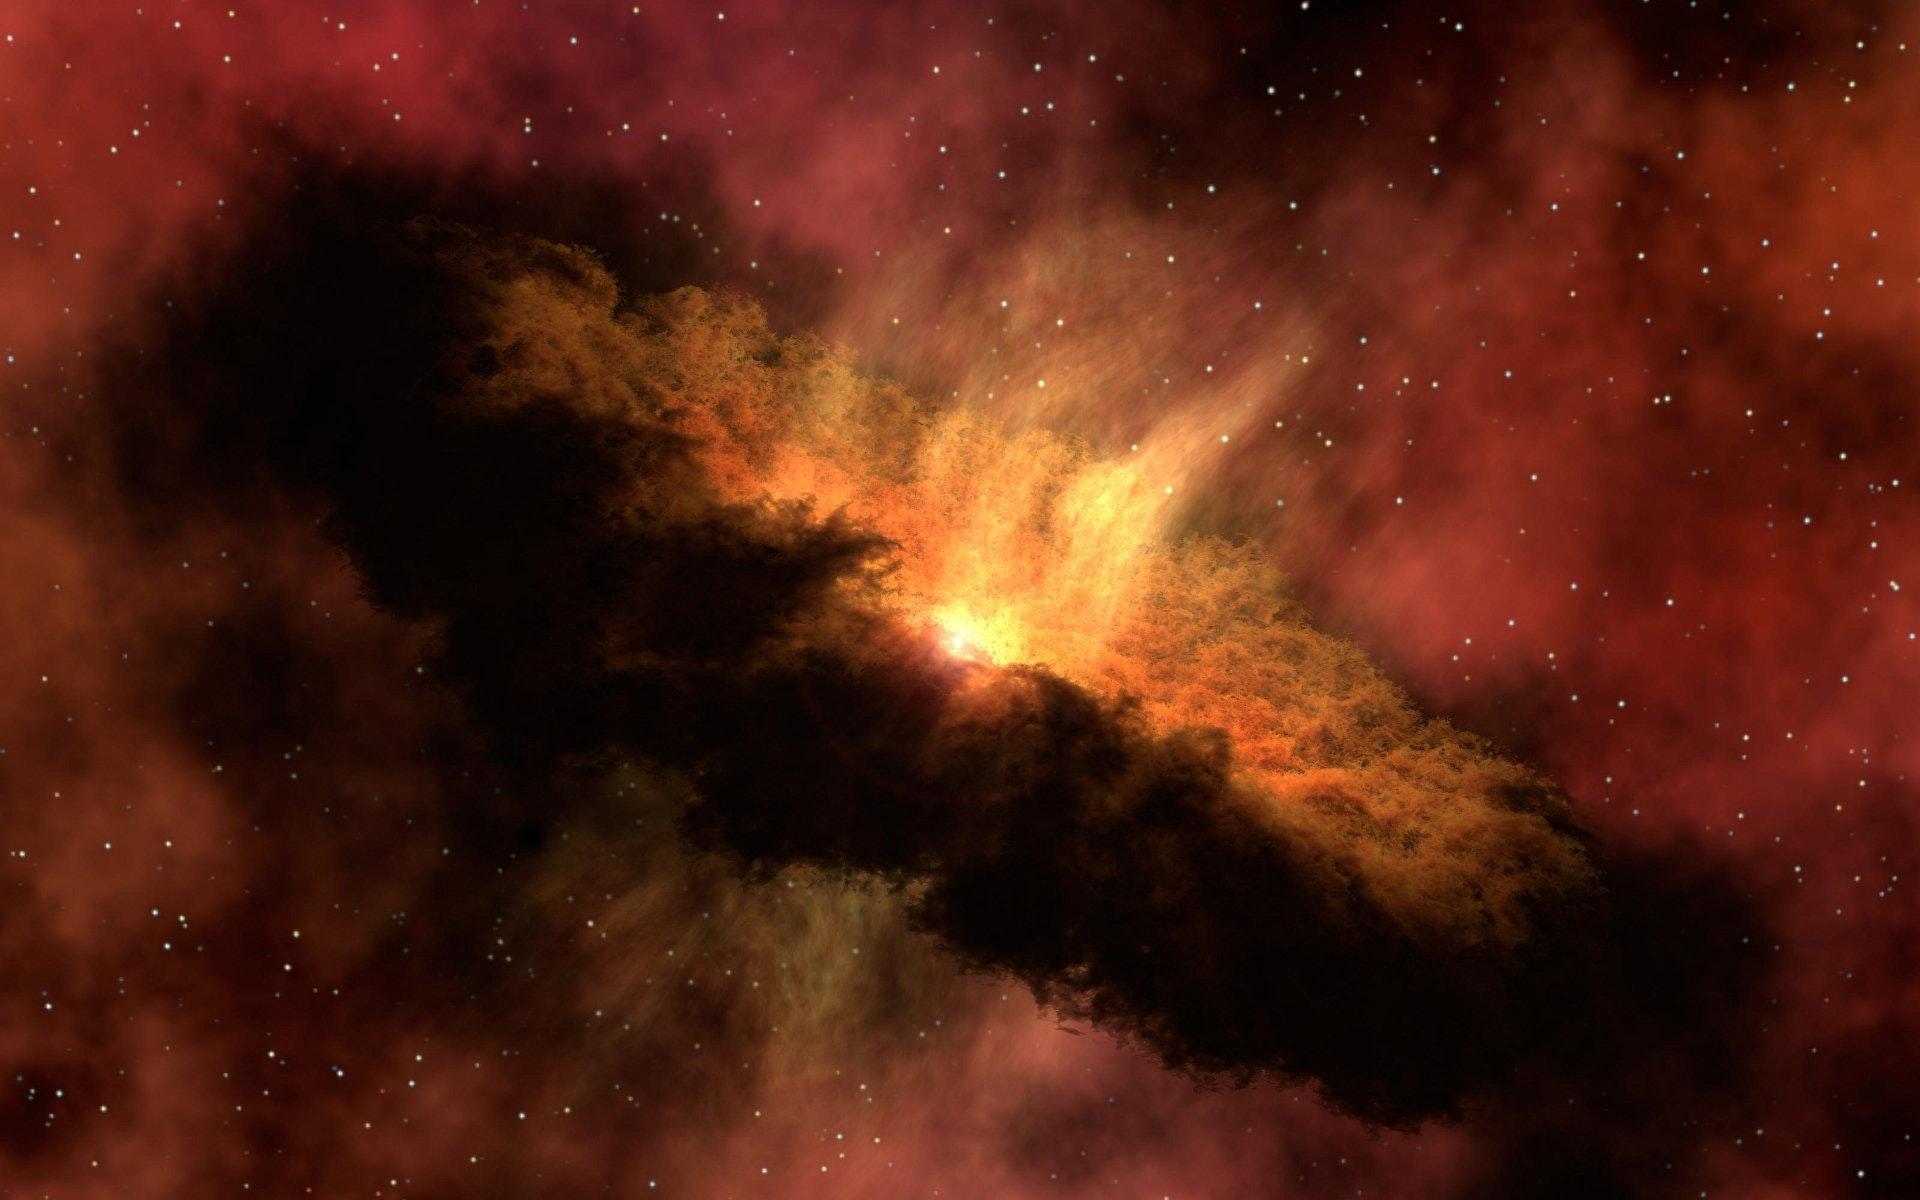 galaxy, red